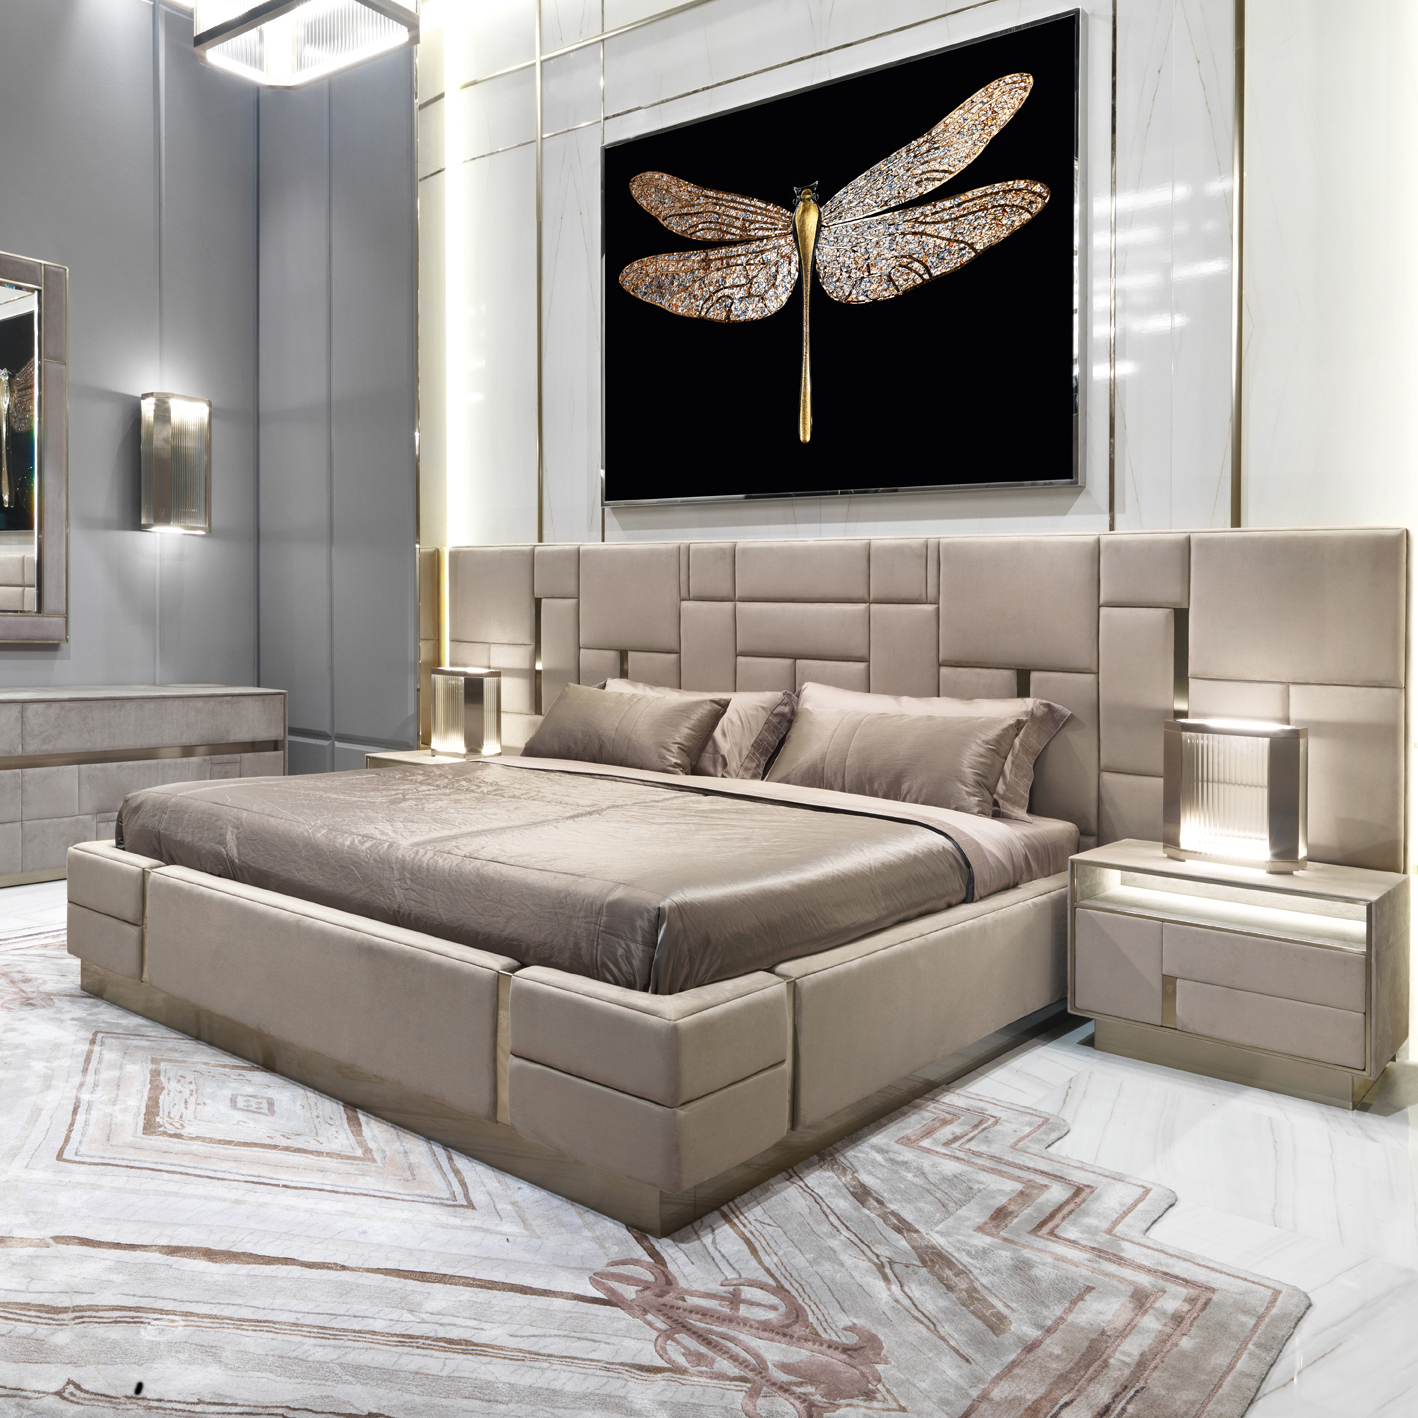 Luxury Italian Bedroom Set Furniture King Size Modern Italian Latest Double Bed Designer Furniture Set Leather Luxury Bed Buy Bed Designer Furniture Latest Double Bed Designs Leather Bed Product On Alibaba Com